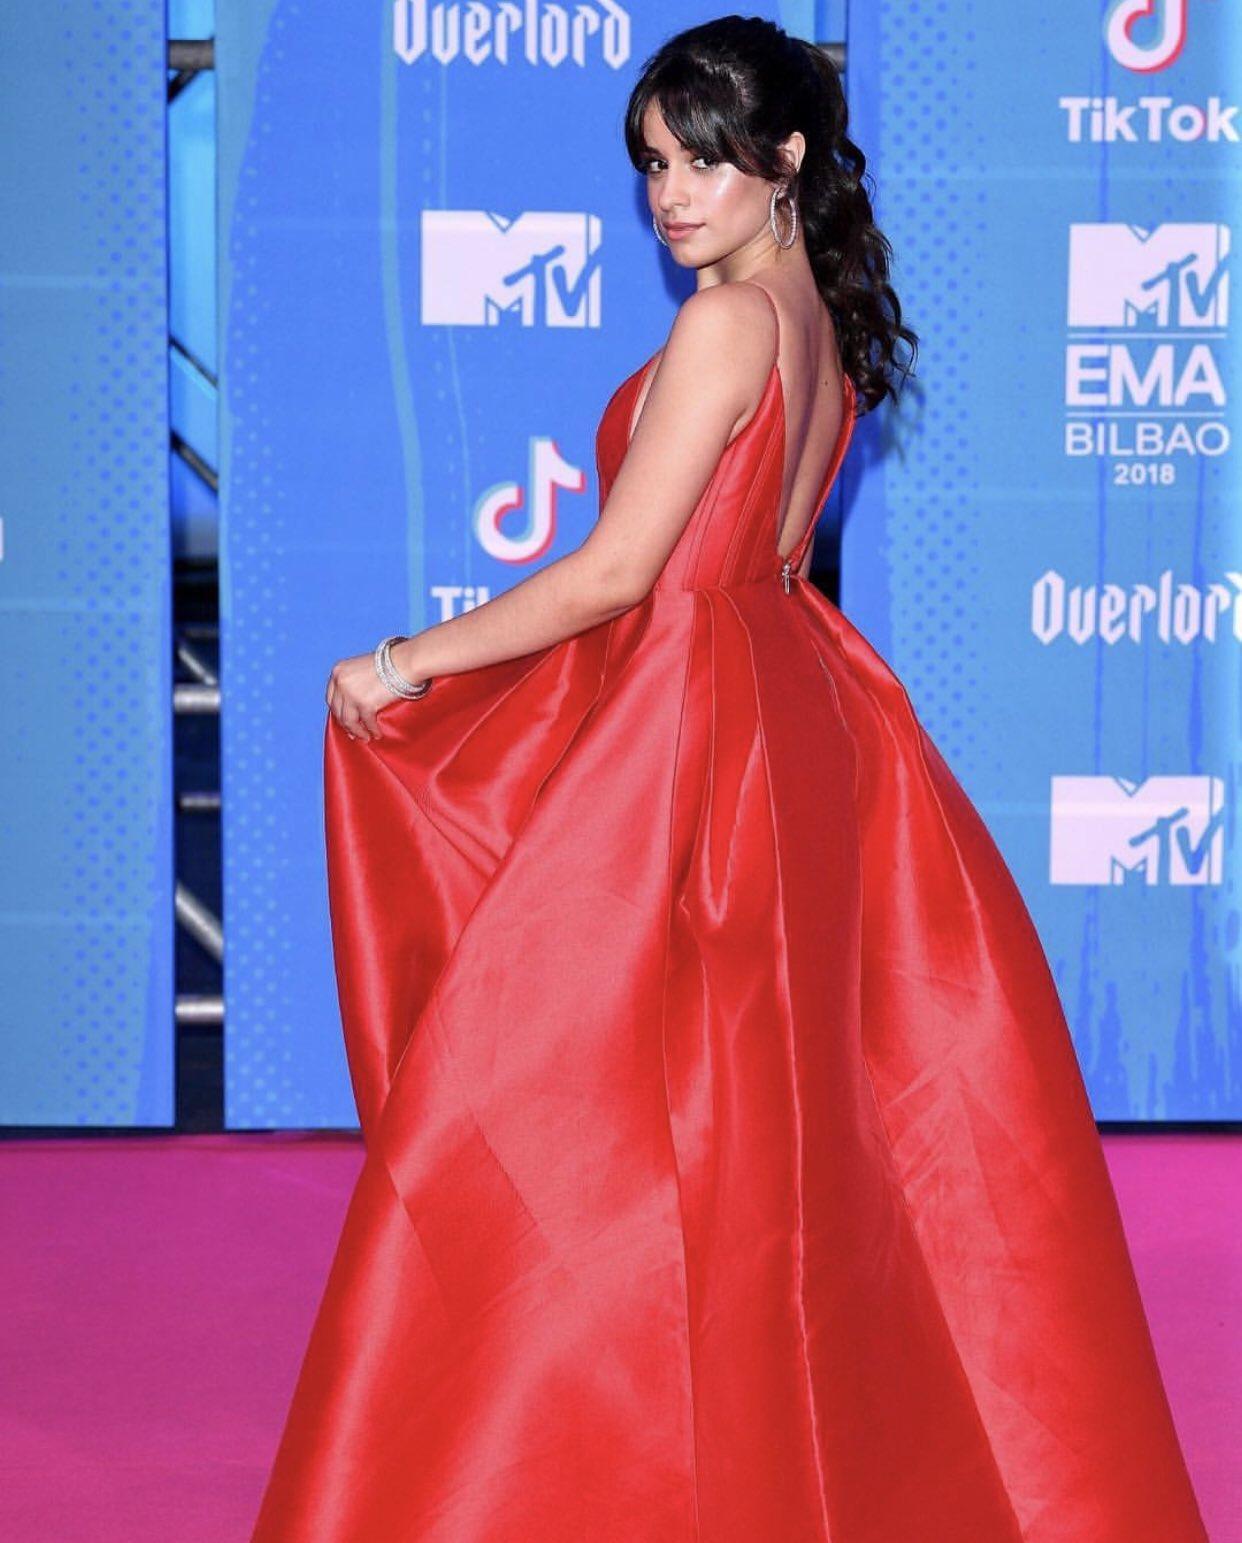 Congratulations @Camila_Cabello on winning FOUR @mtvema awards!! ���� https://t.co/XzH0HmdEg5